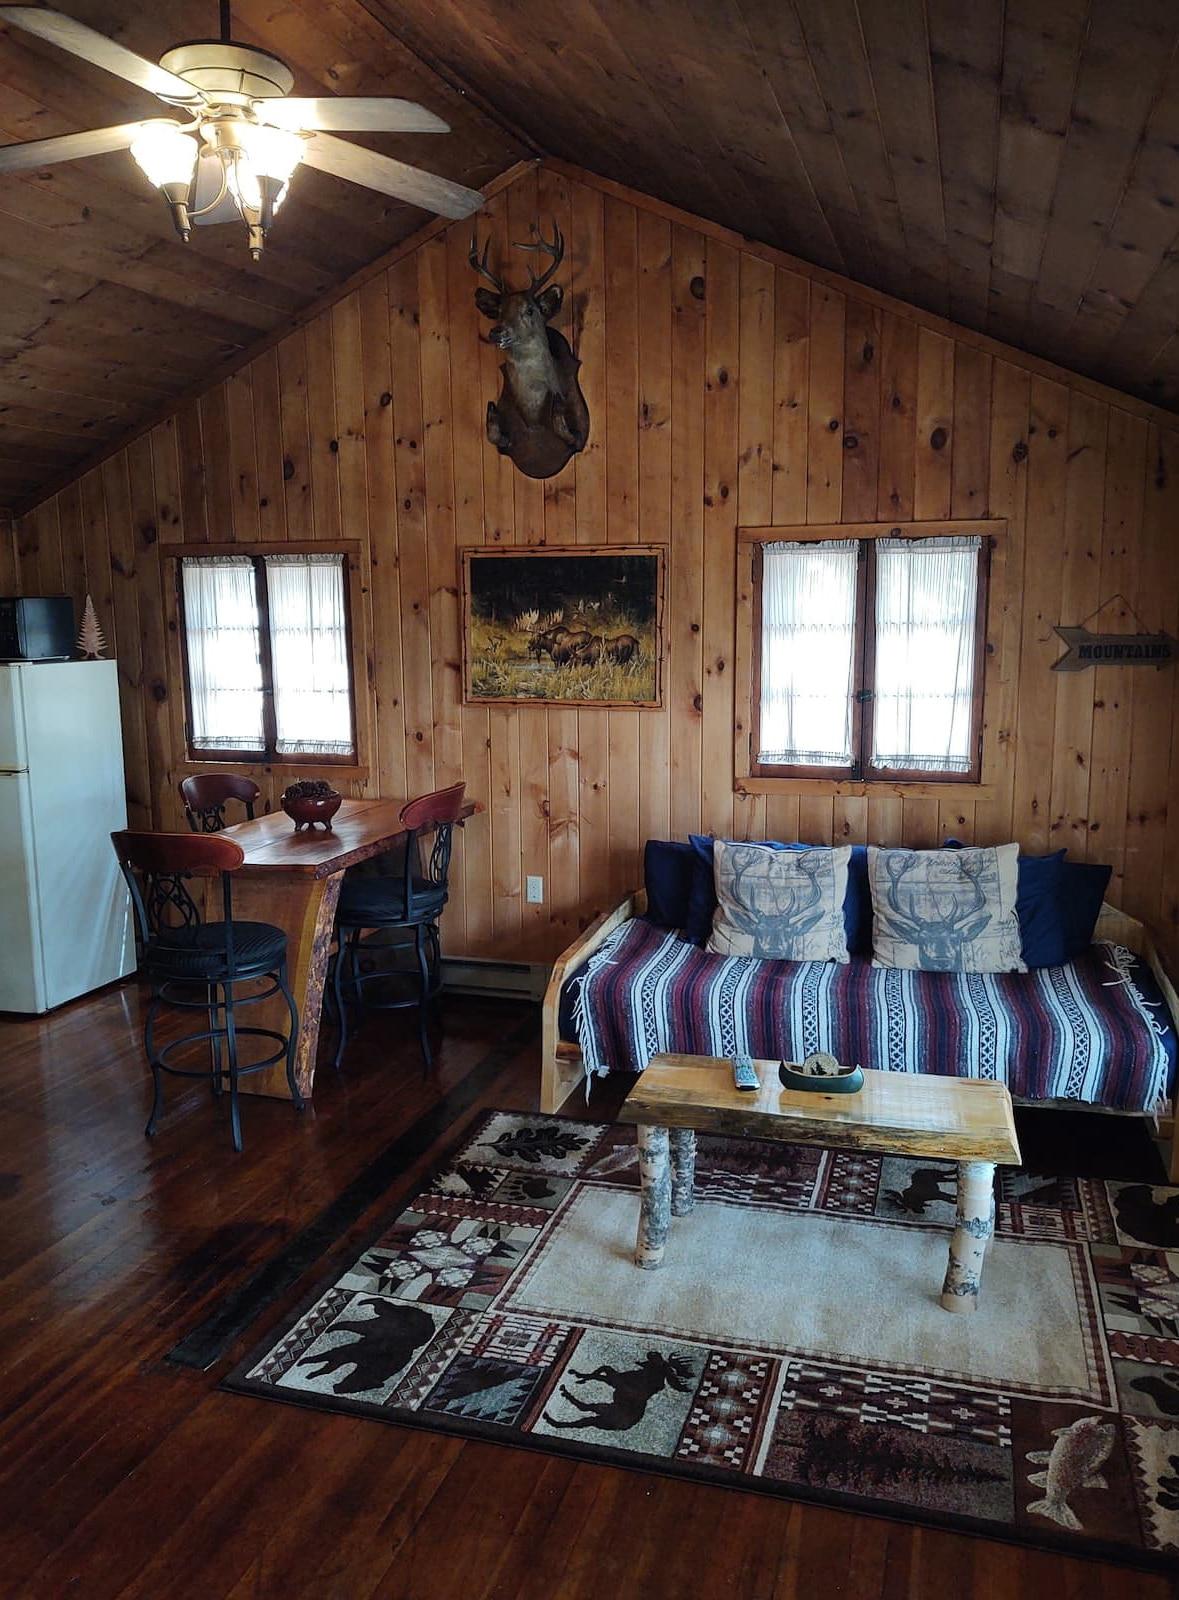 Bell Crest Cabin Adirondacks, Interior